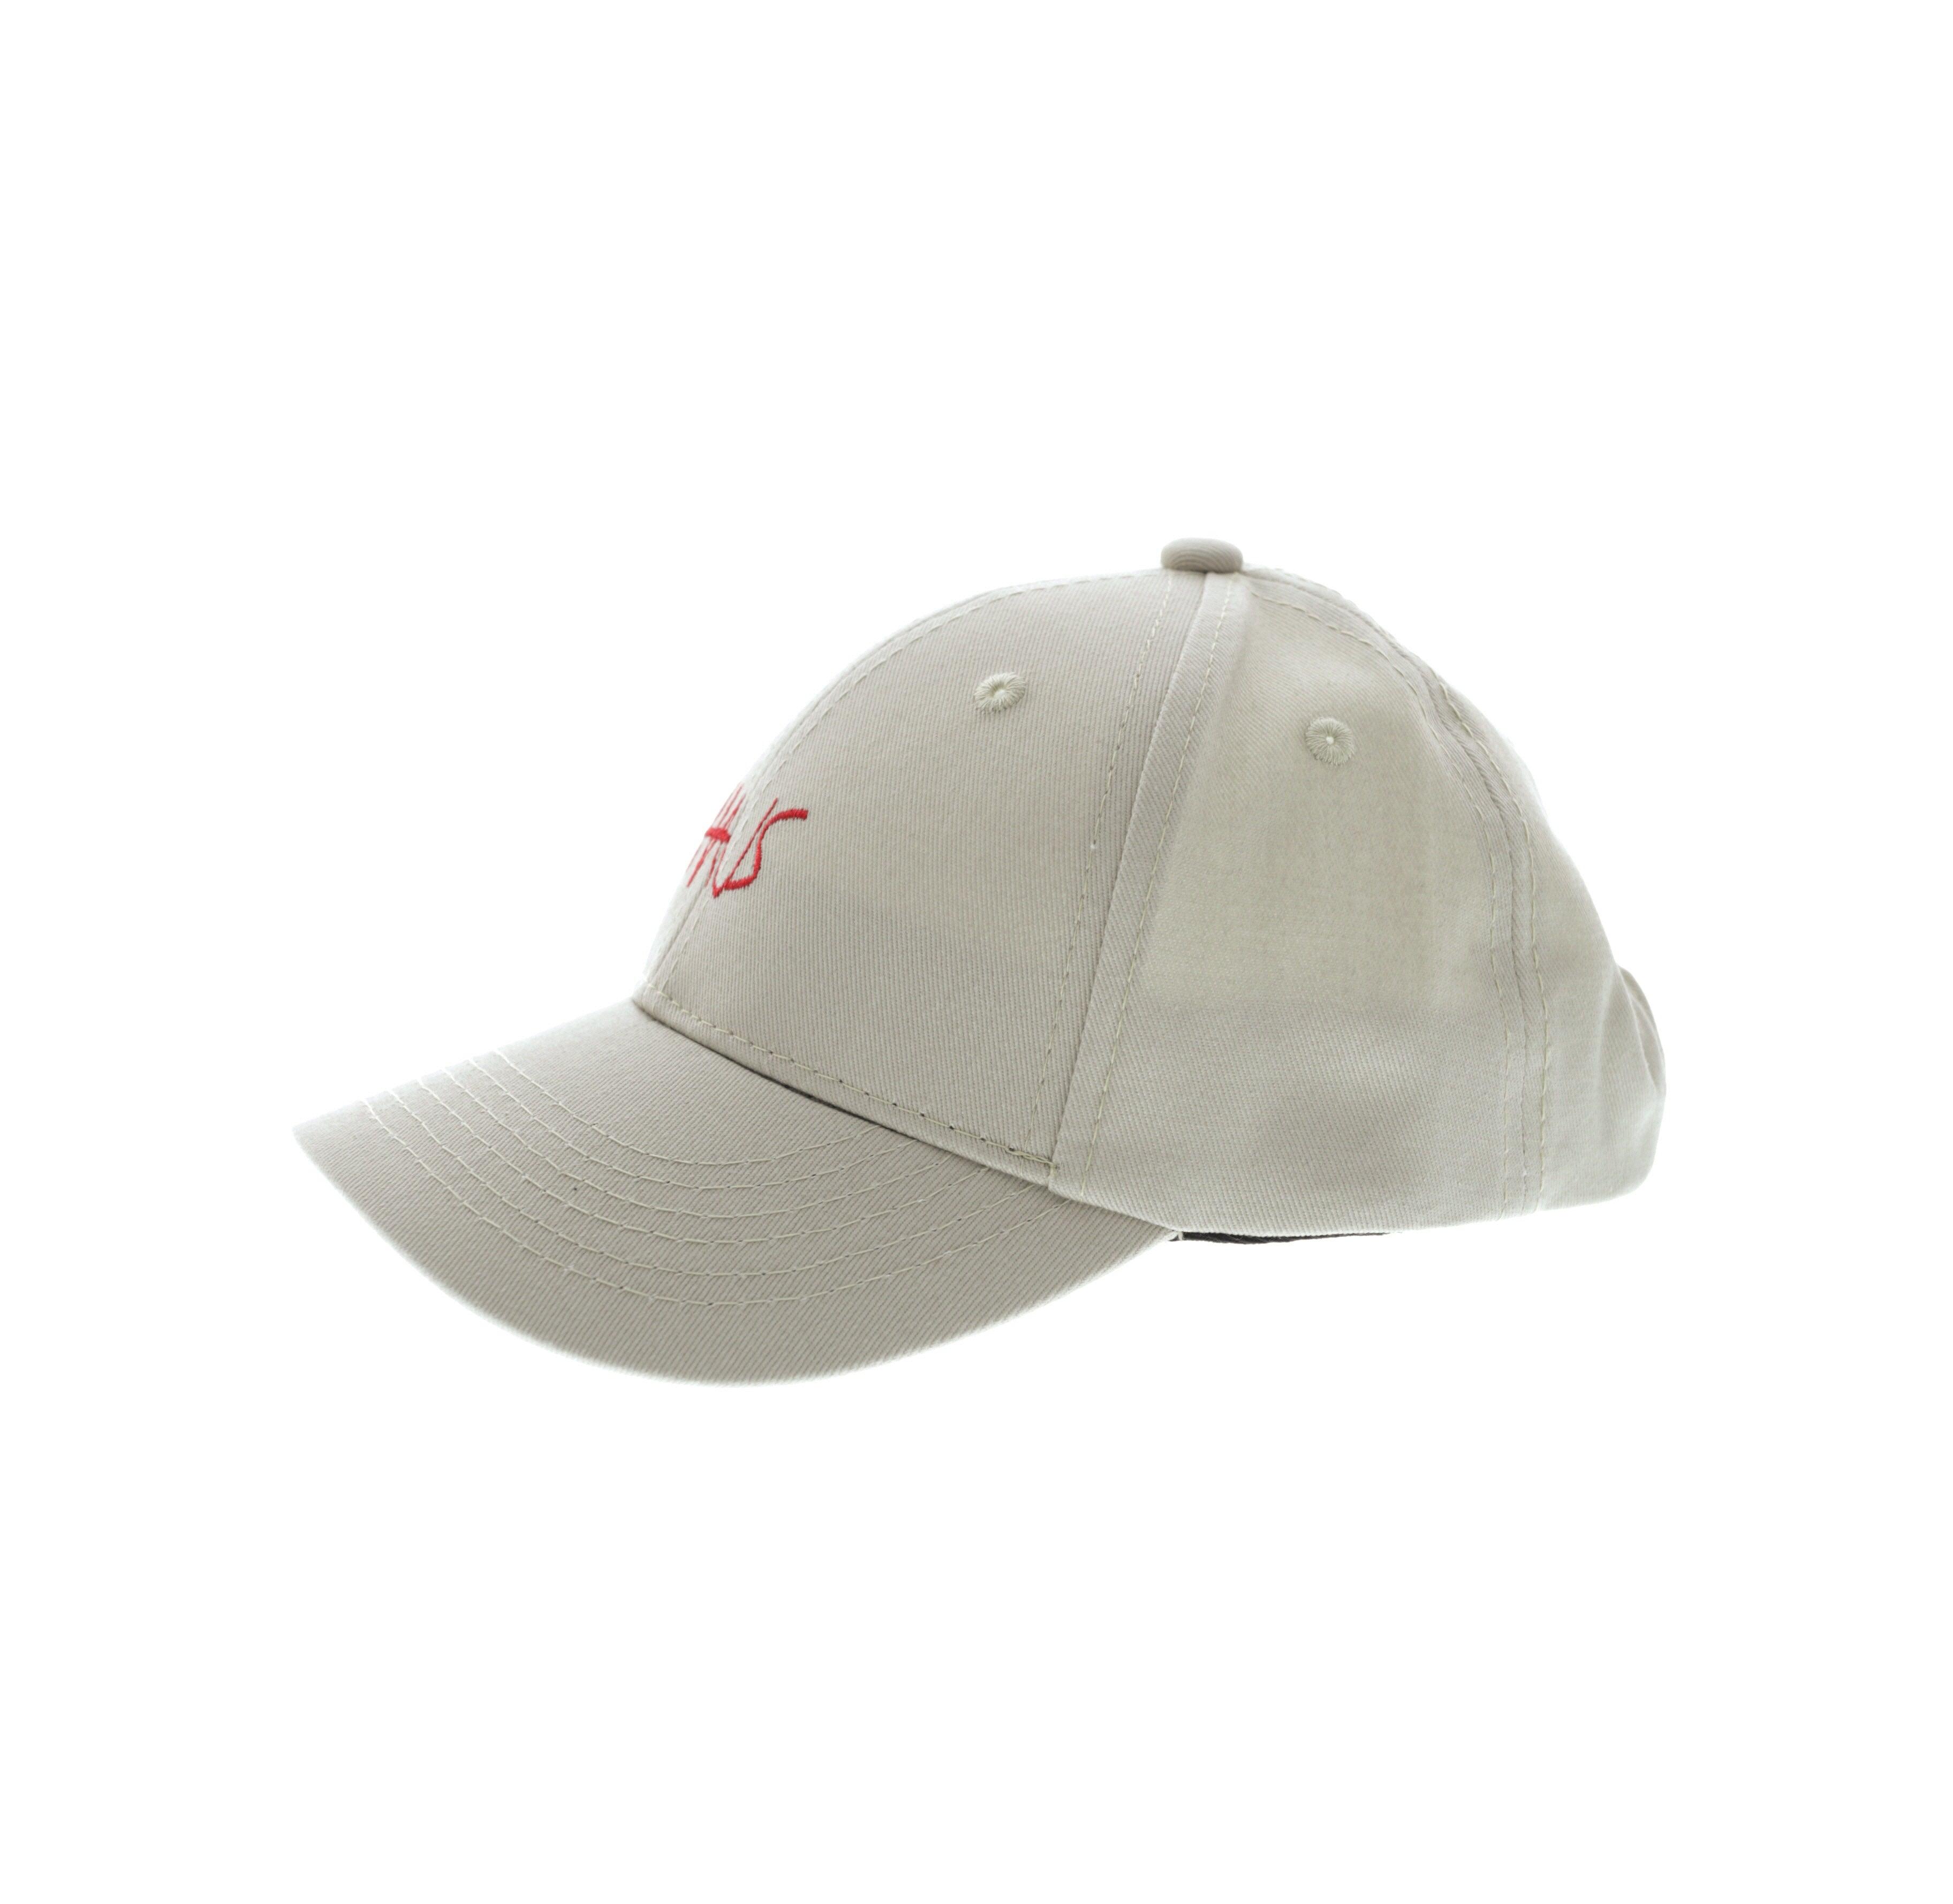 Creme HAUS OF JR Skylar Script Snapback Hat -Unisex